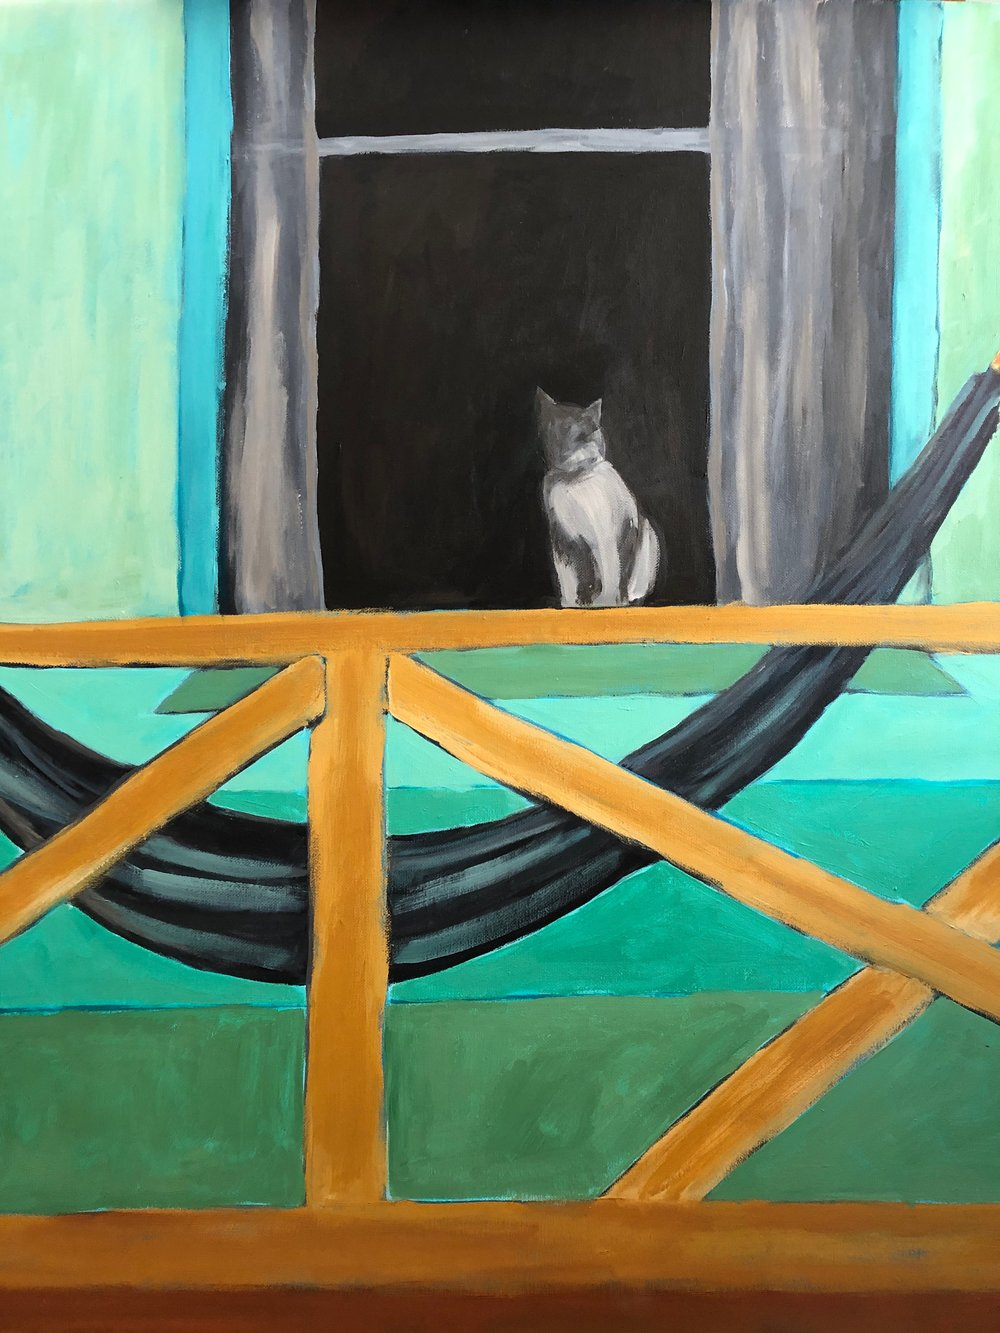 Rincon Cat